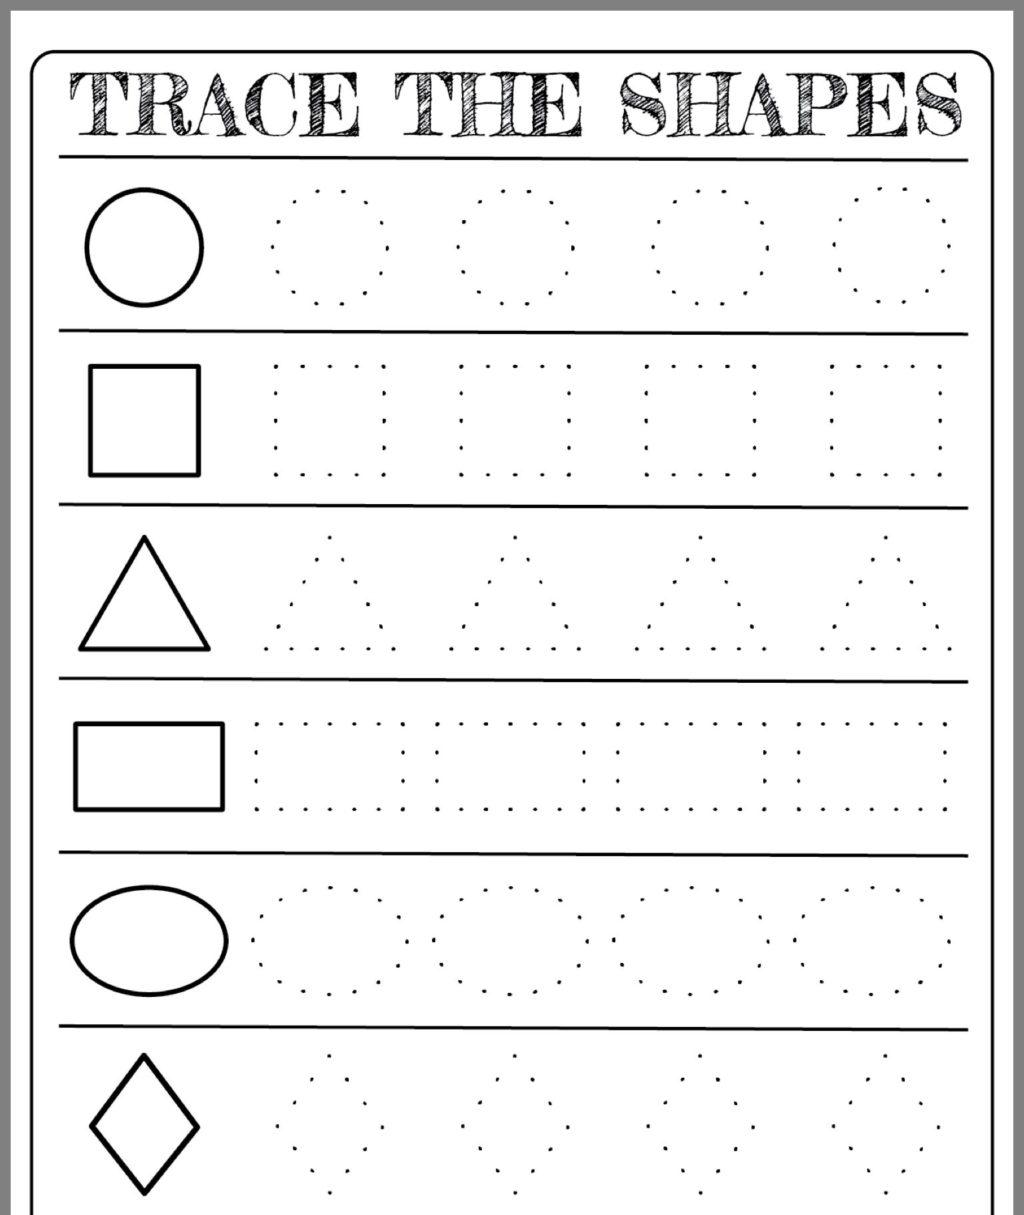 Worksheet ~ Freerintable Shapes Worksheets For Toddlers